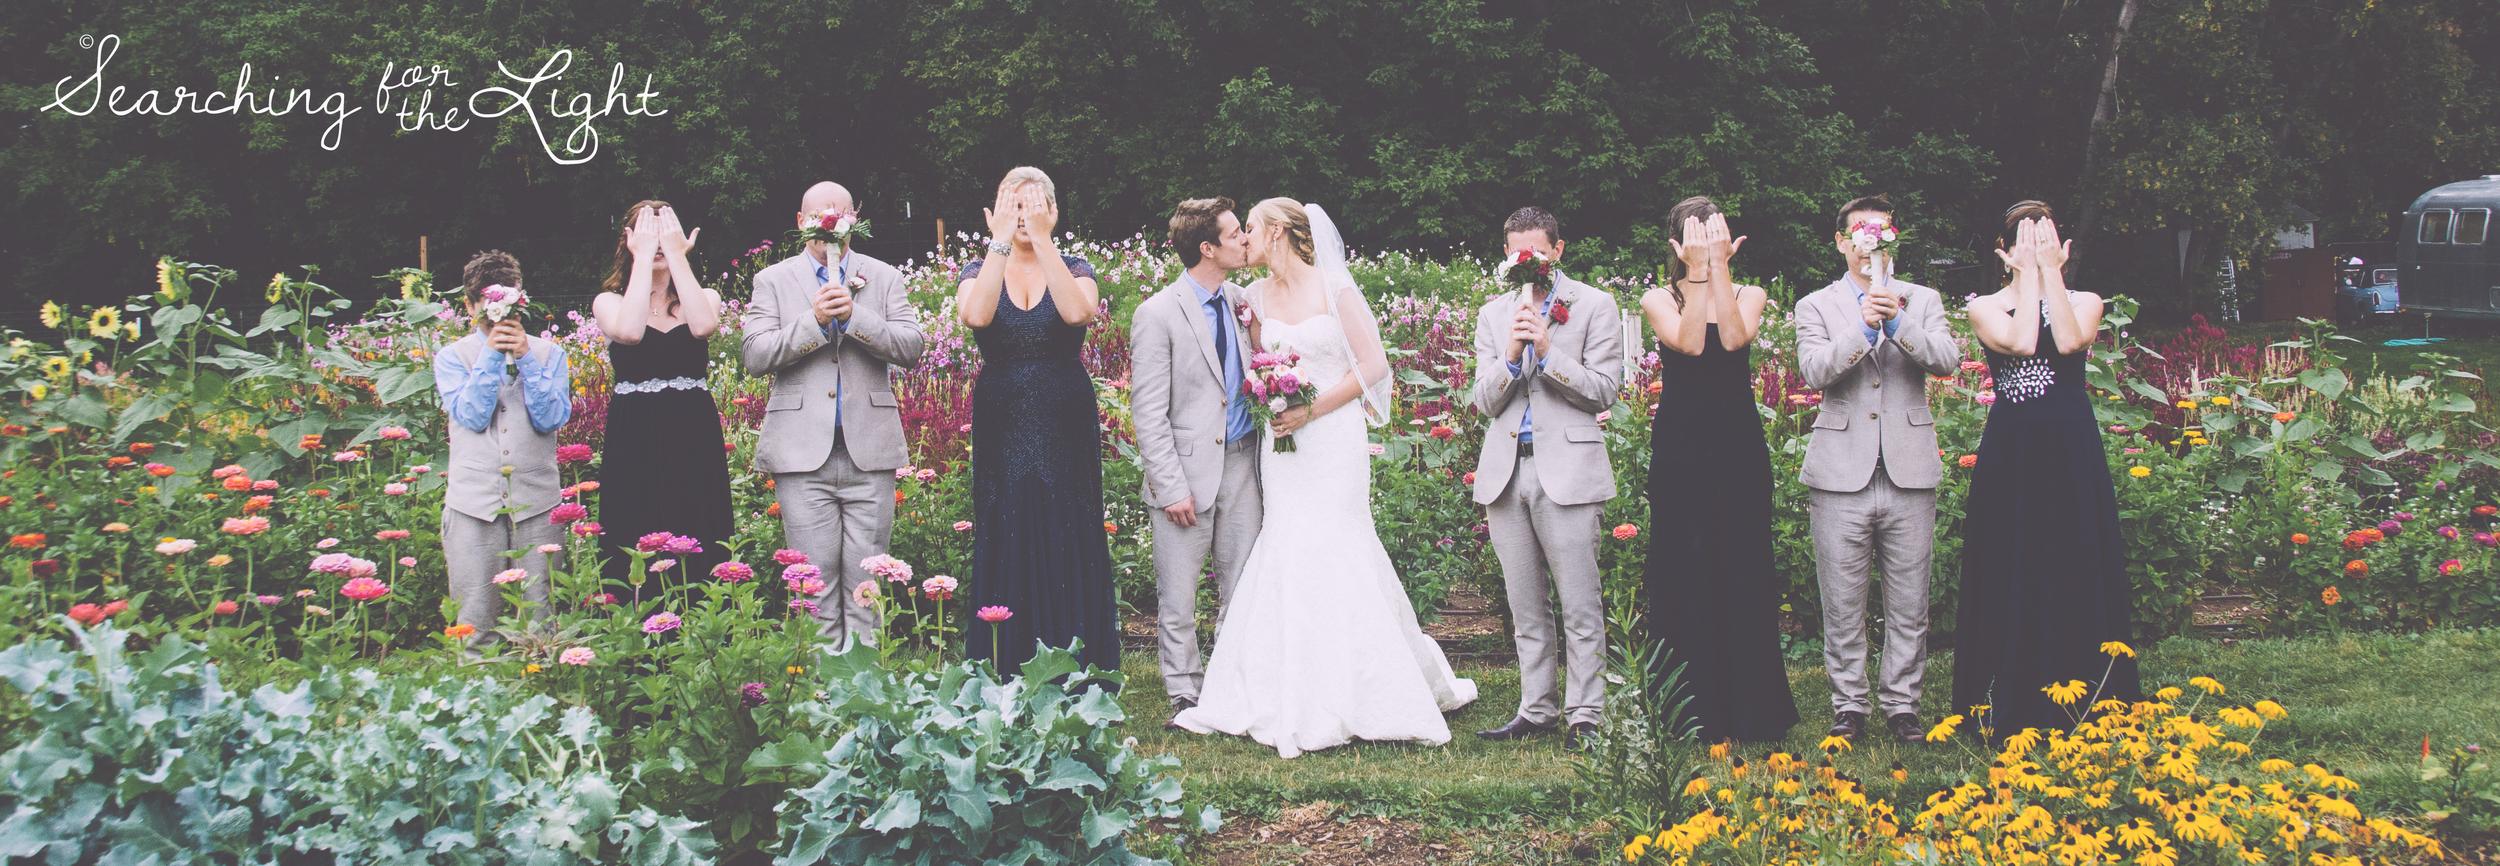 lyons farmette wedding photo, lyons farmette, denver wedding photographer